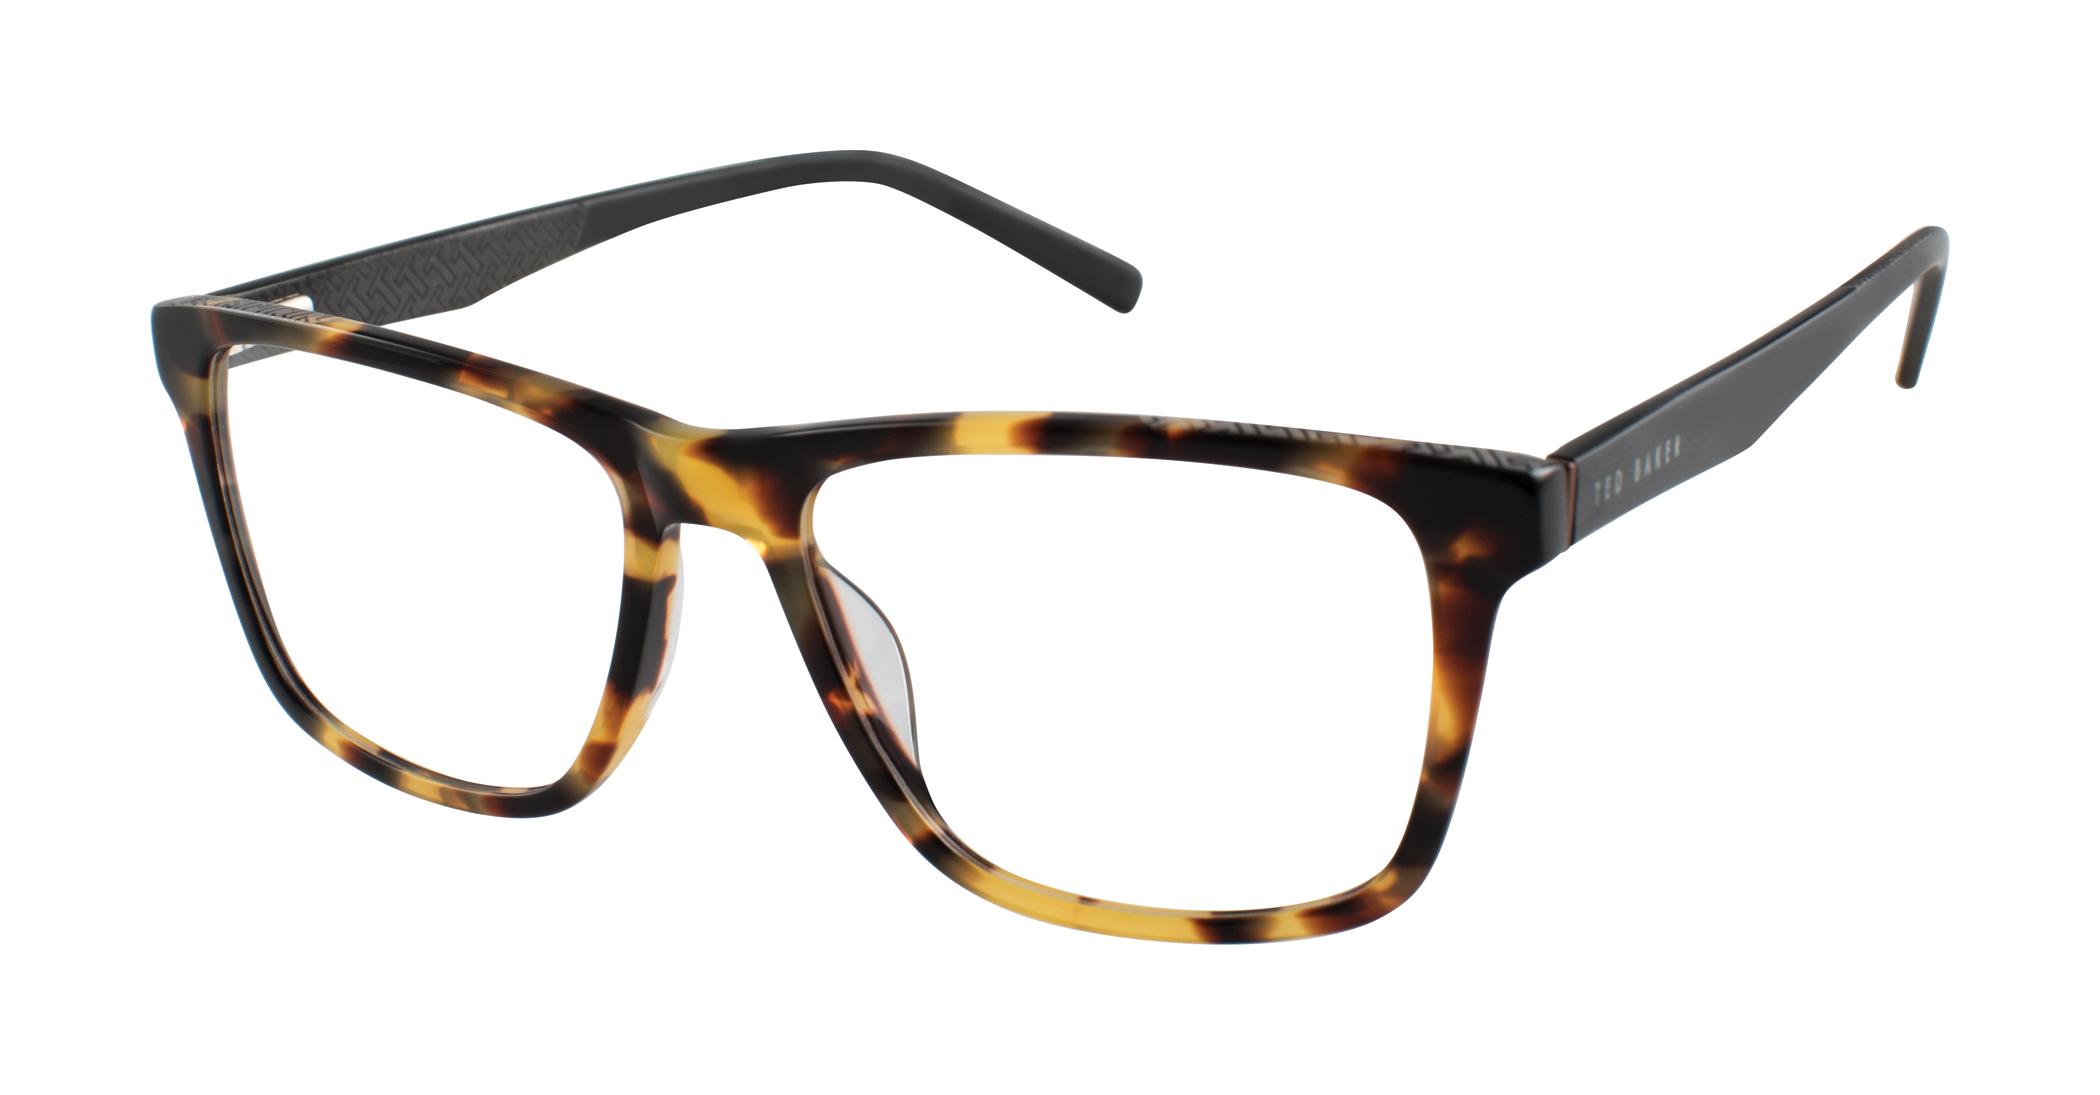 Eyeglasses dallas - Eyeglasses Dallas 74